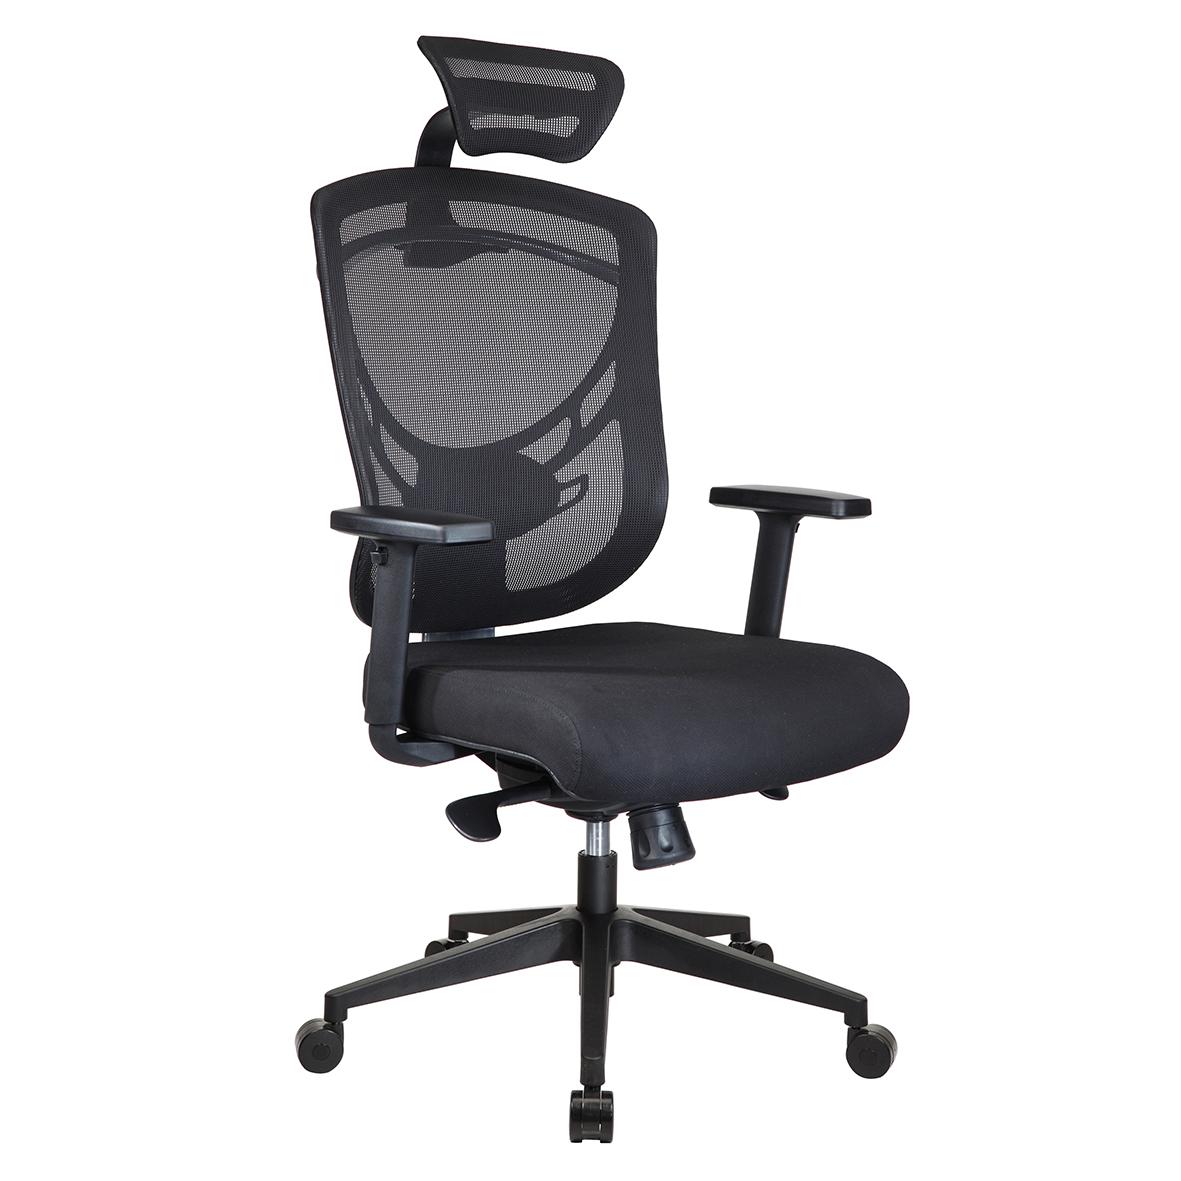 UPlan umesh chair HB.jpg